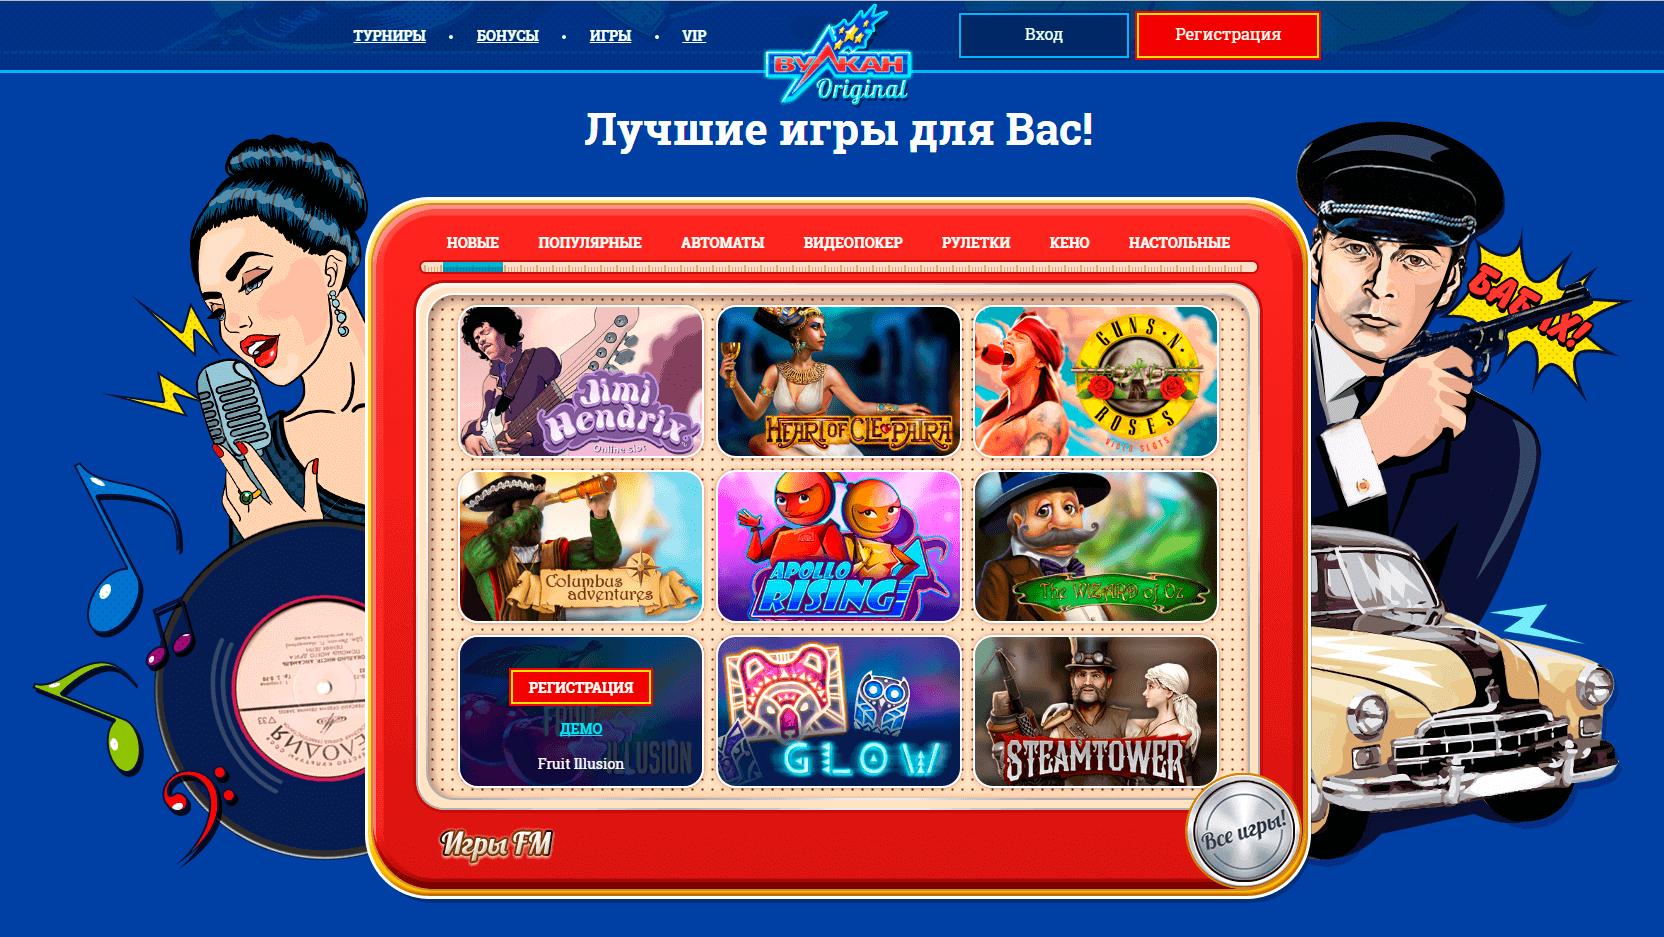 Сайты онлайн-казино Vulcan Original